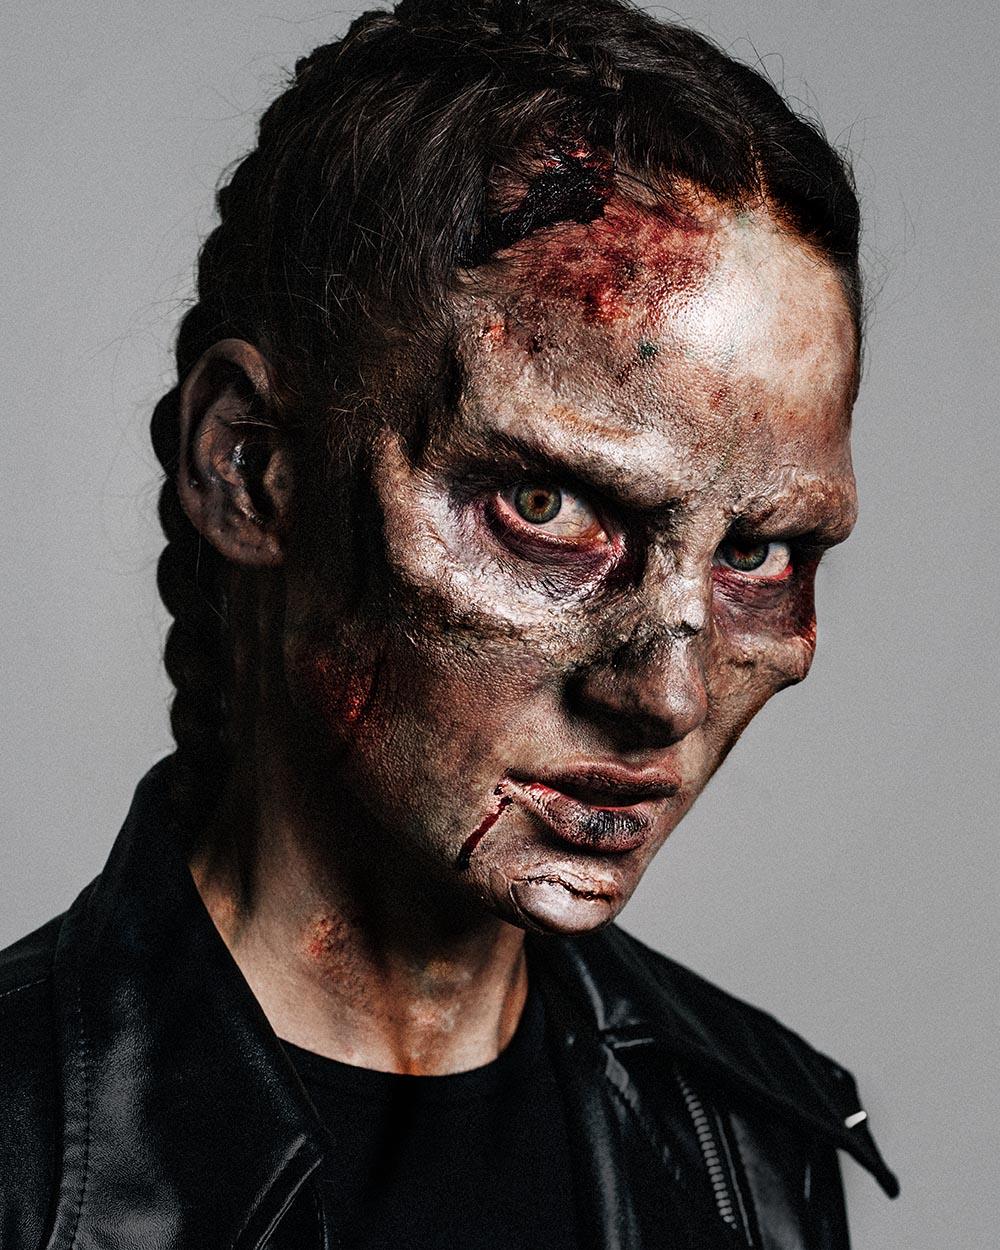 online-makeup-courses-SFX-02.jpg